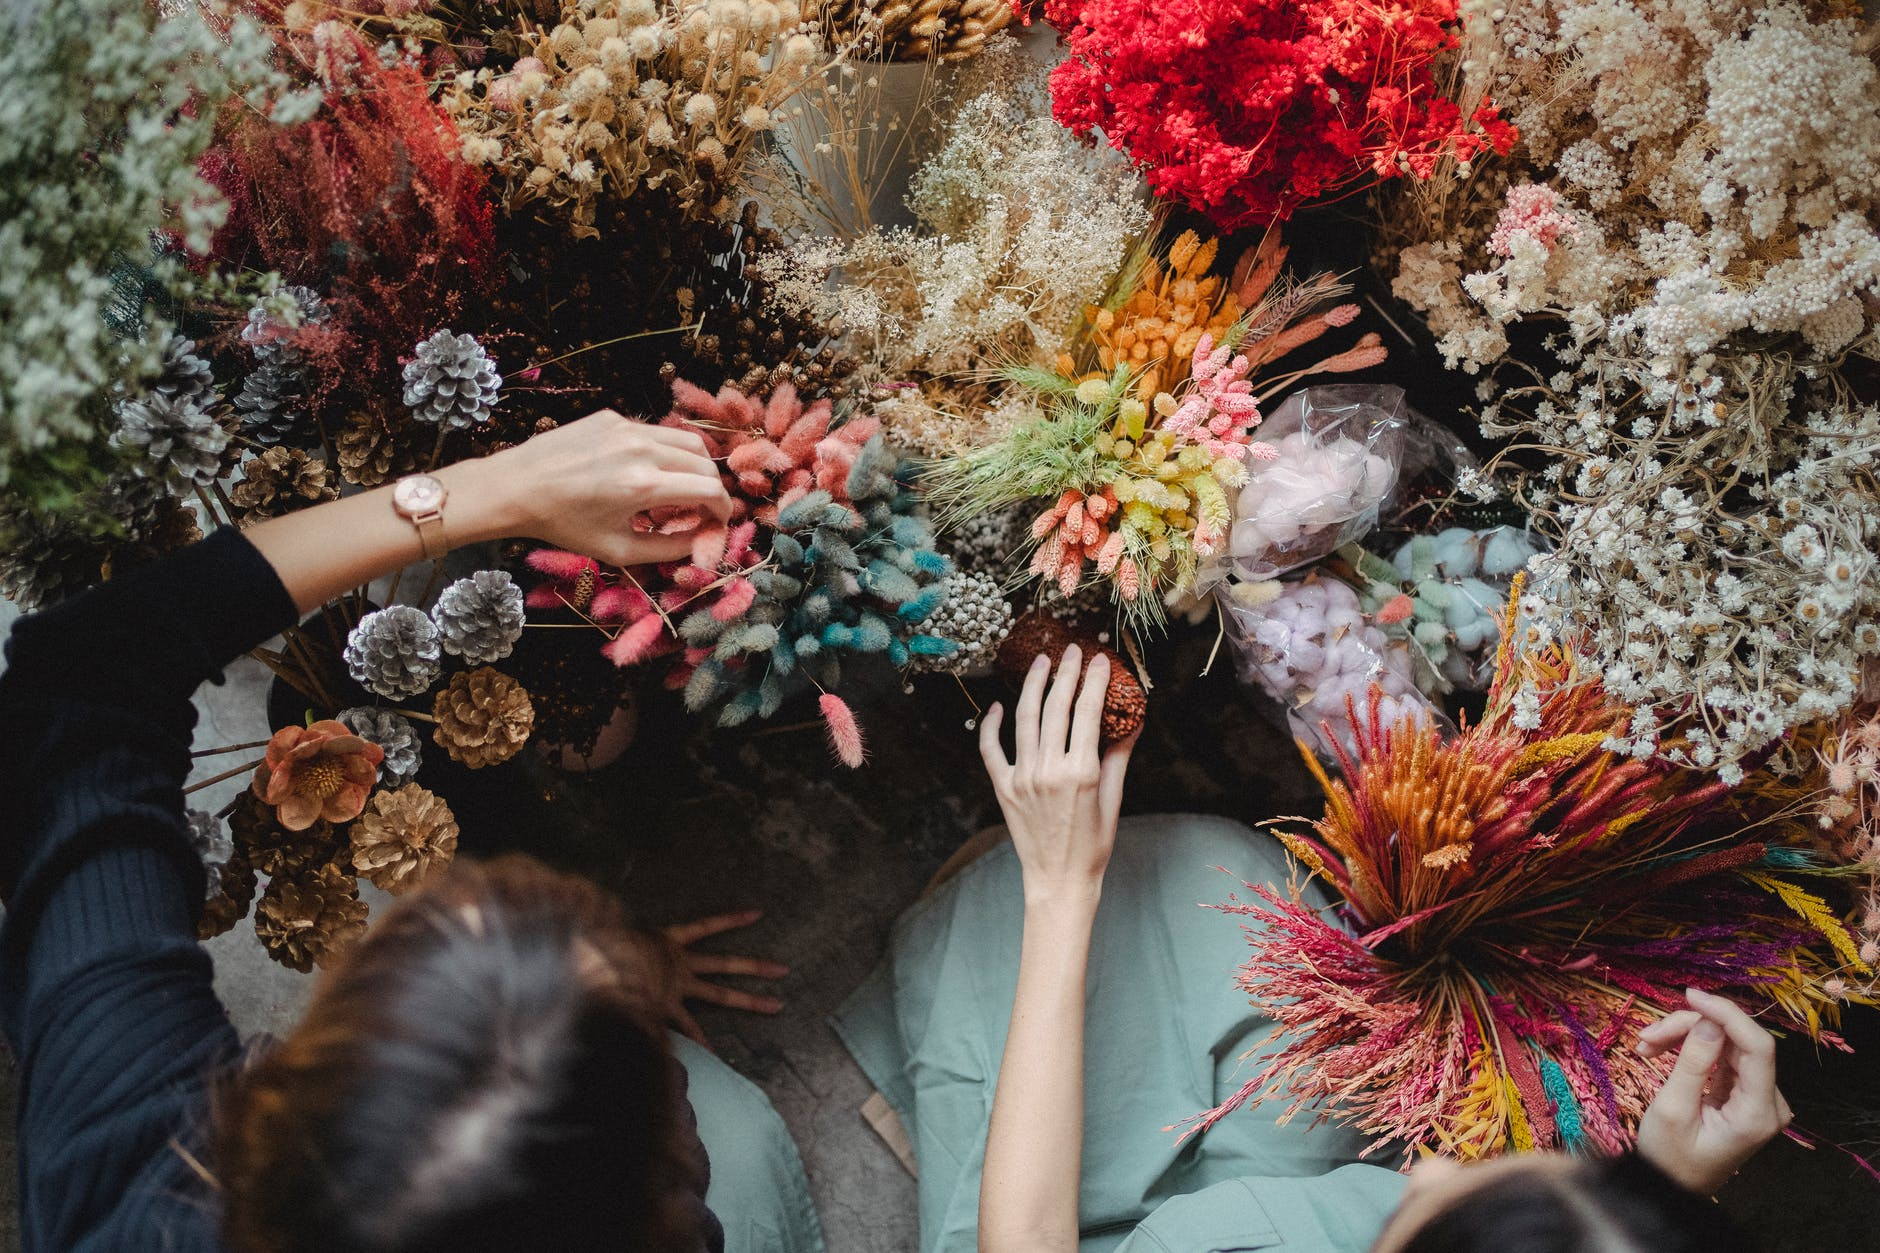 crop faceless florists touching decorative bouquet elements and flowers